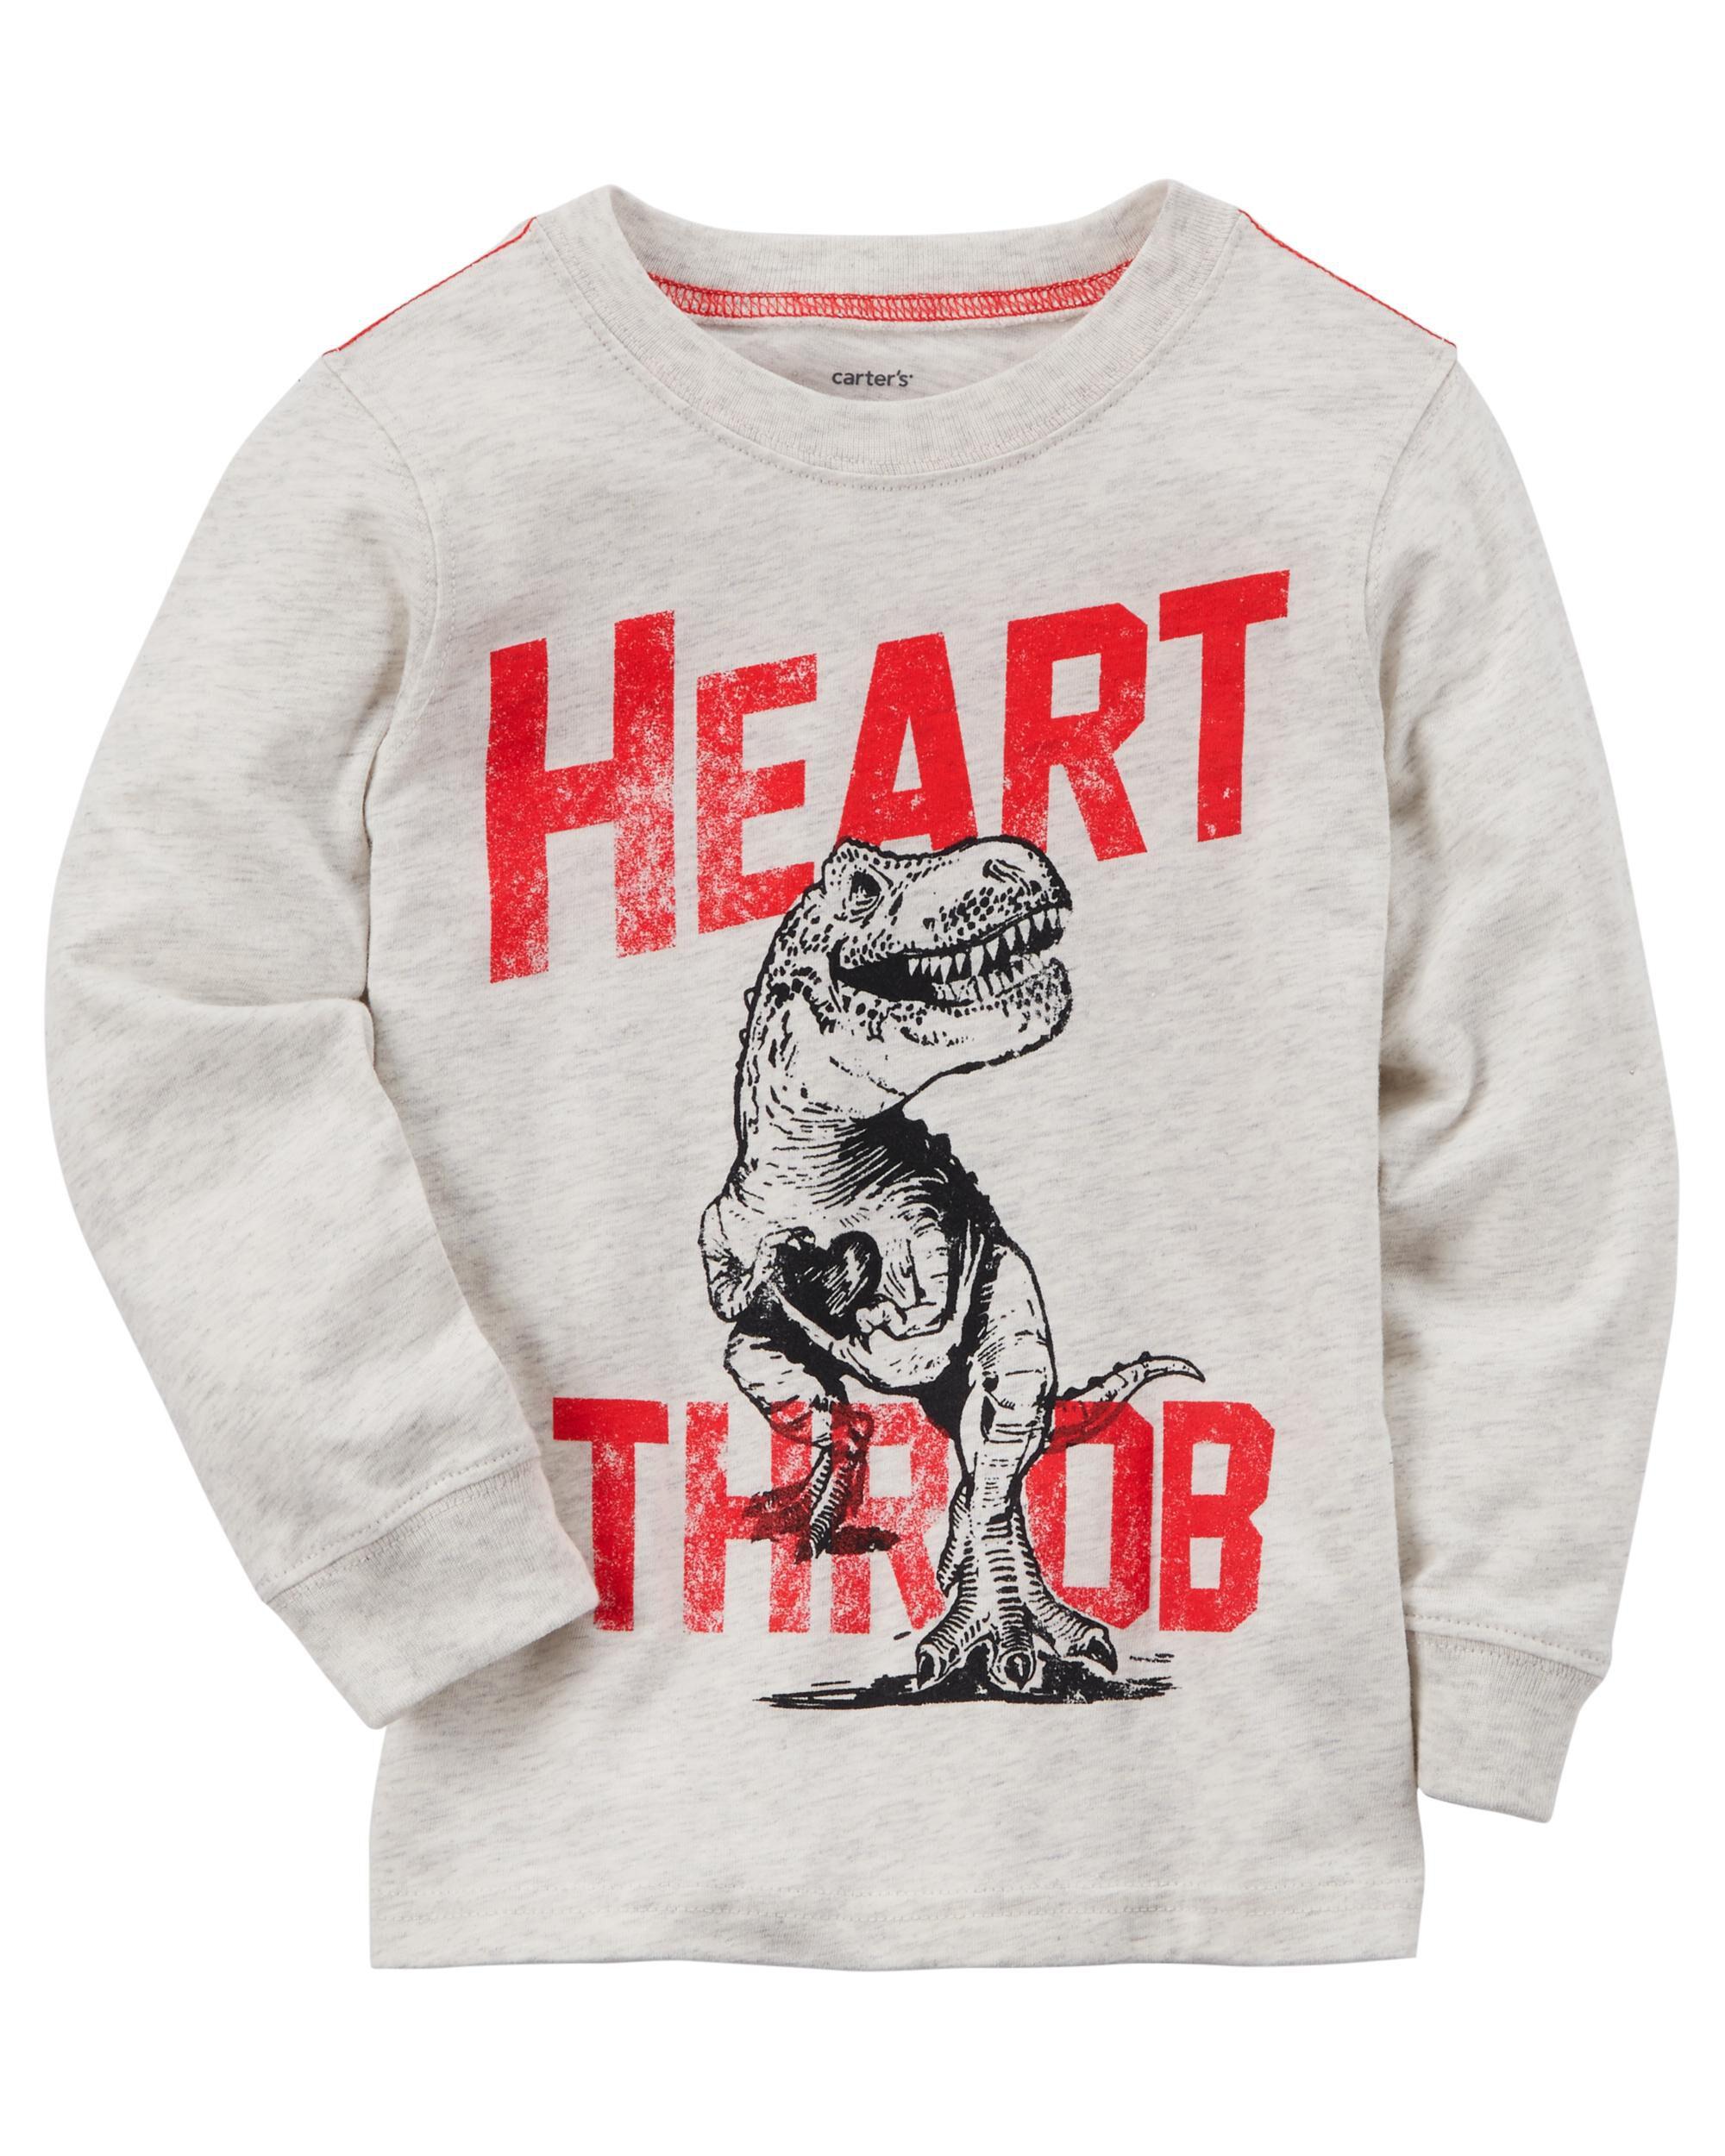 Heart Throb Jersey Tee